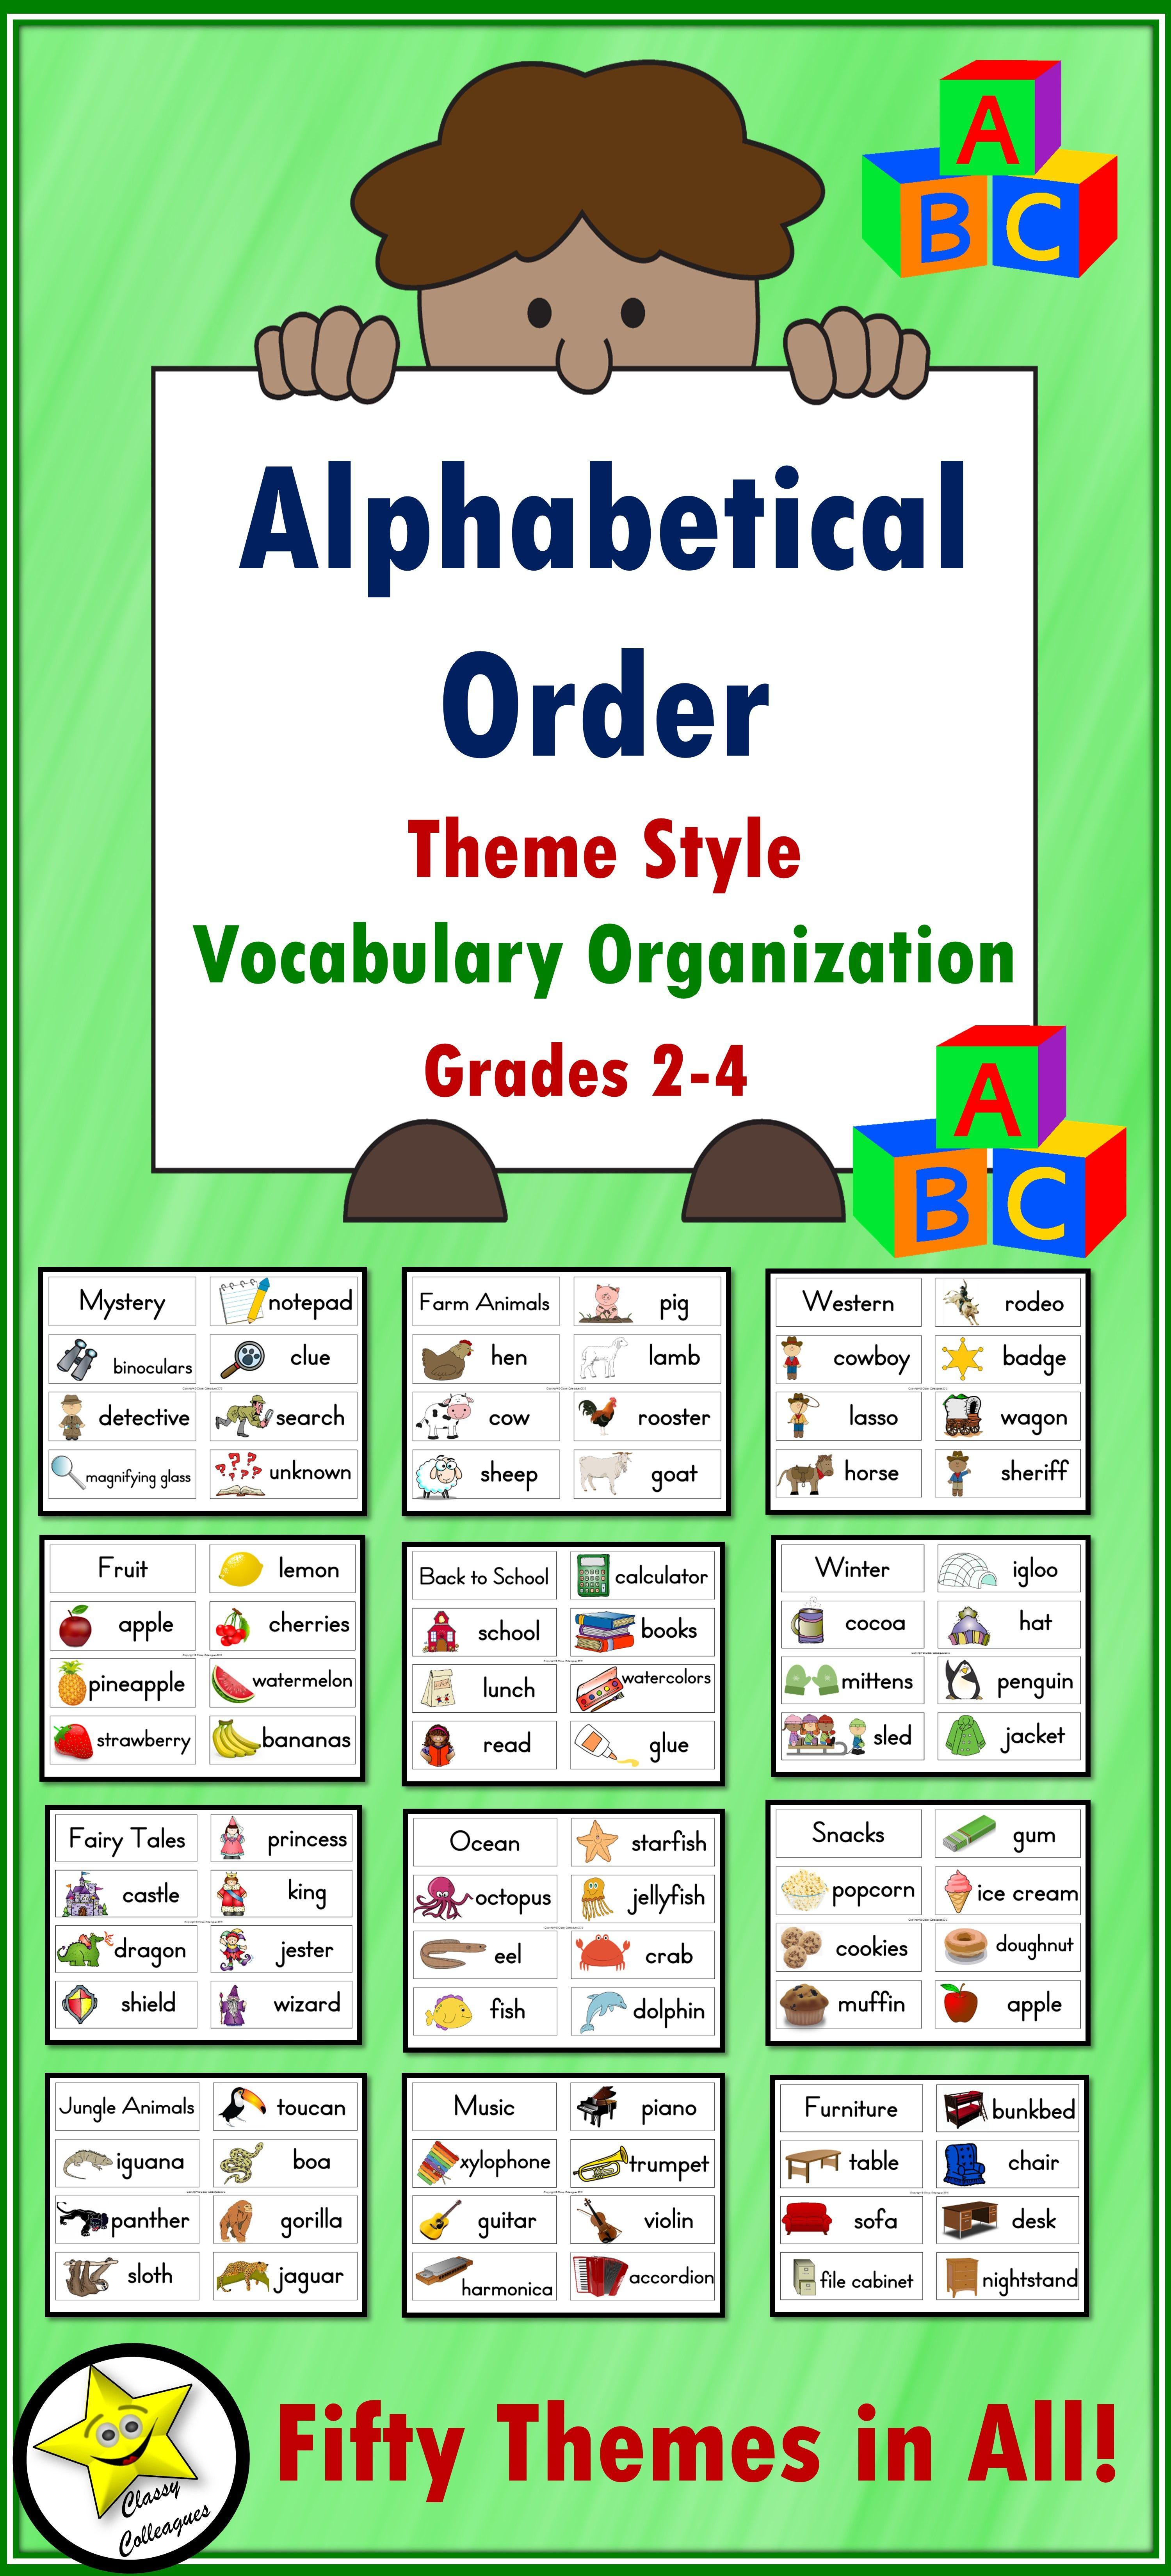 Alphabetical Order Theme Style